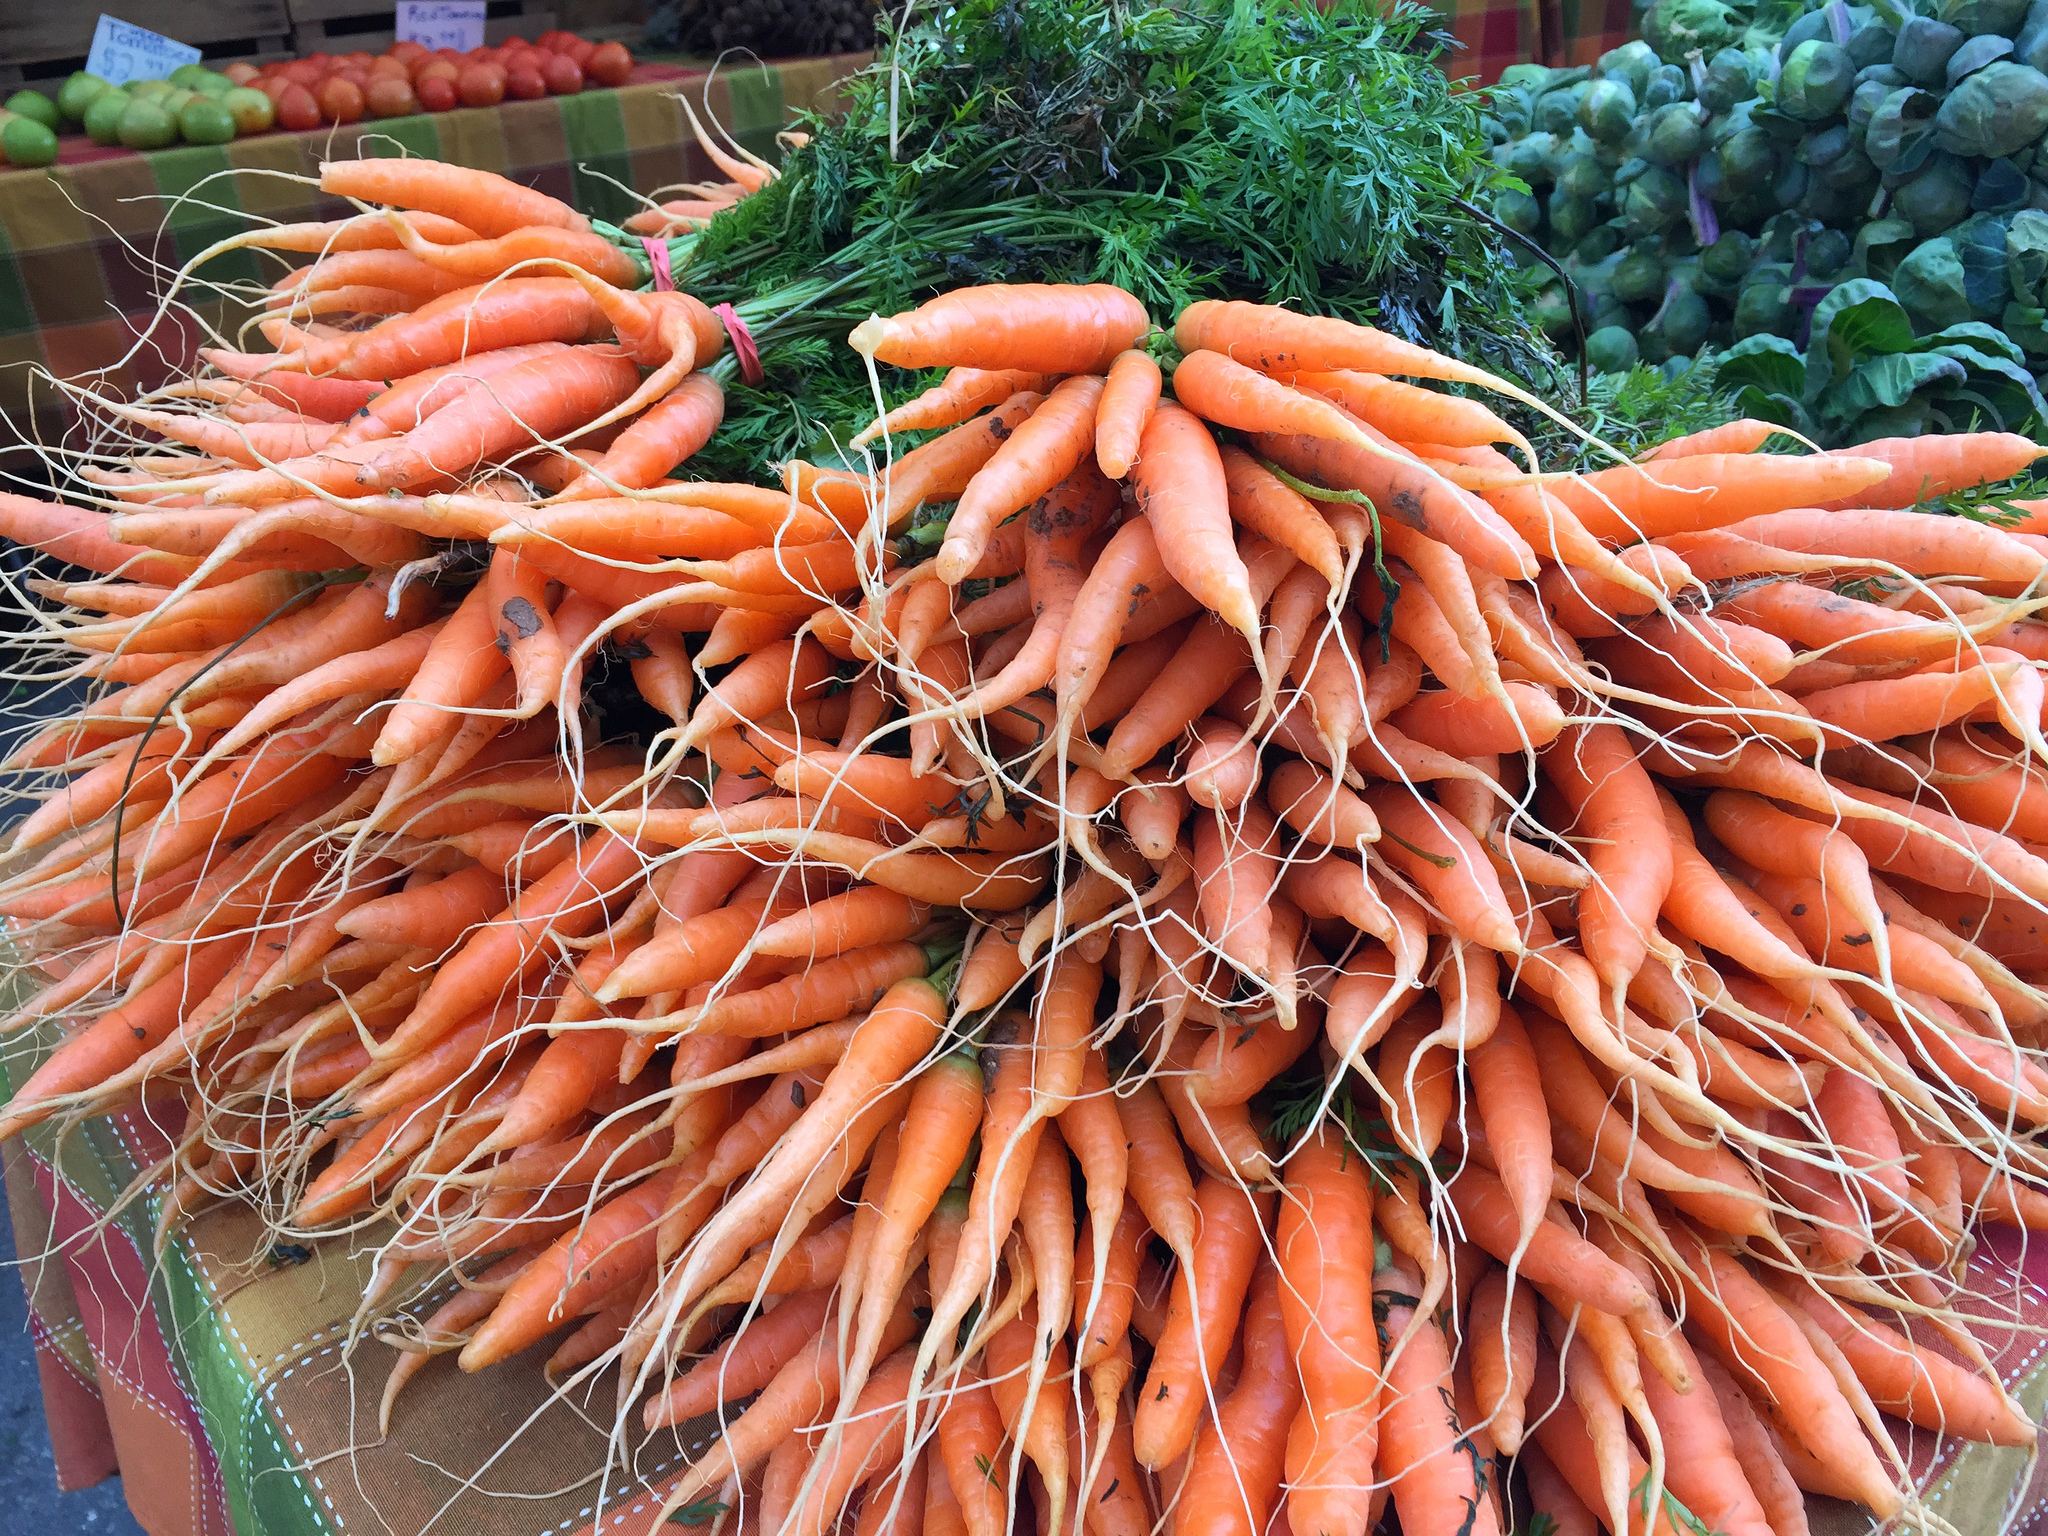 "Carrots at Silver Spring's FreshFarm Market. Photograph via Flickr user <a href=""https://www.flickr.com/photos/afagen/38093188354"">Adam Fagen</a>."